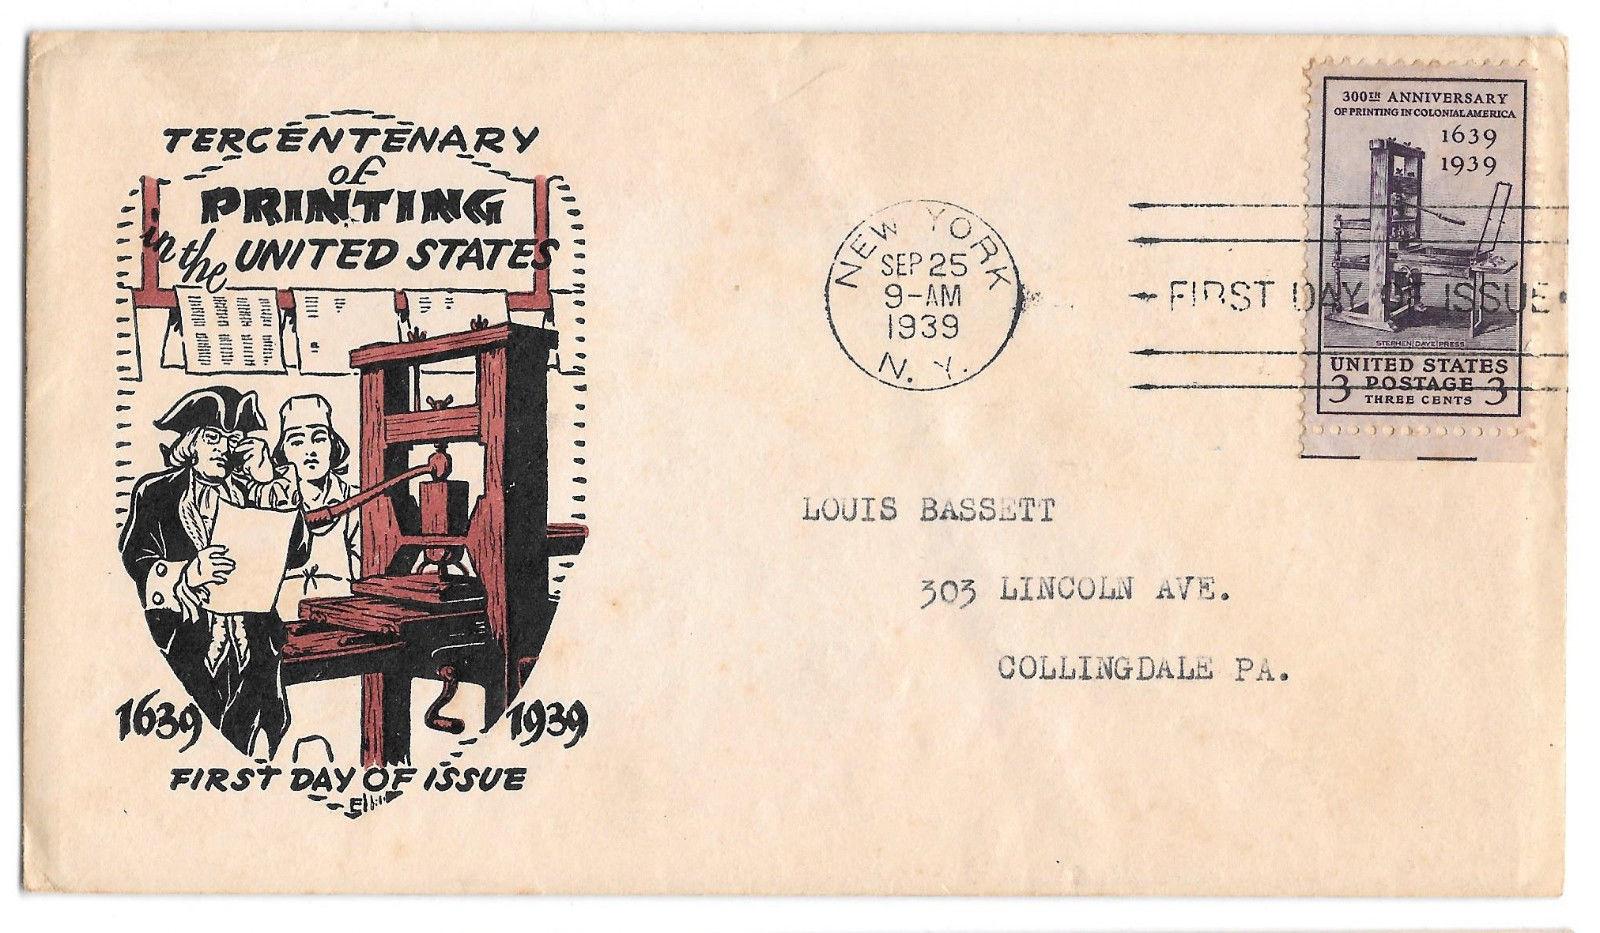 FDC Sc 857 Printing Tercentenary Washington Stamp Exchange Cachet Planty #2